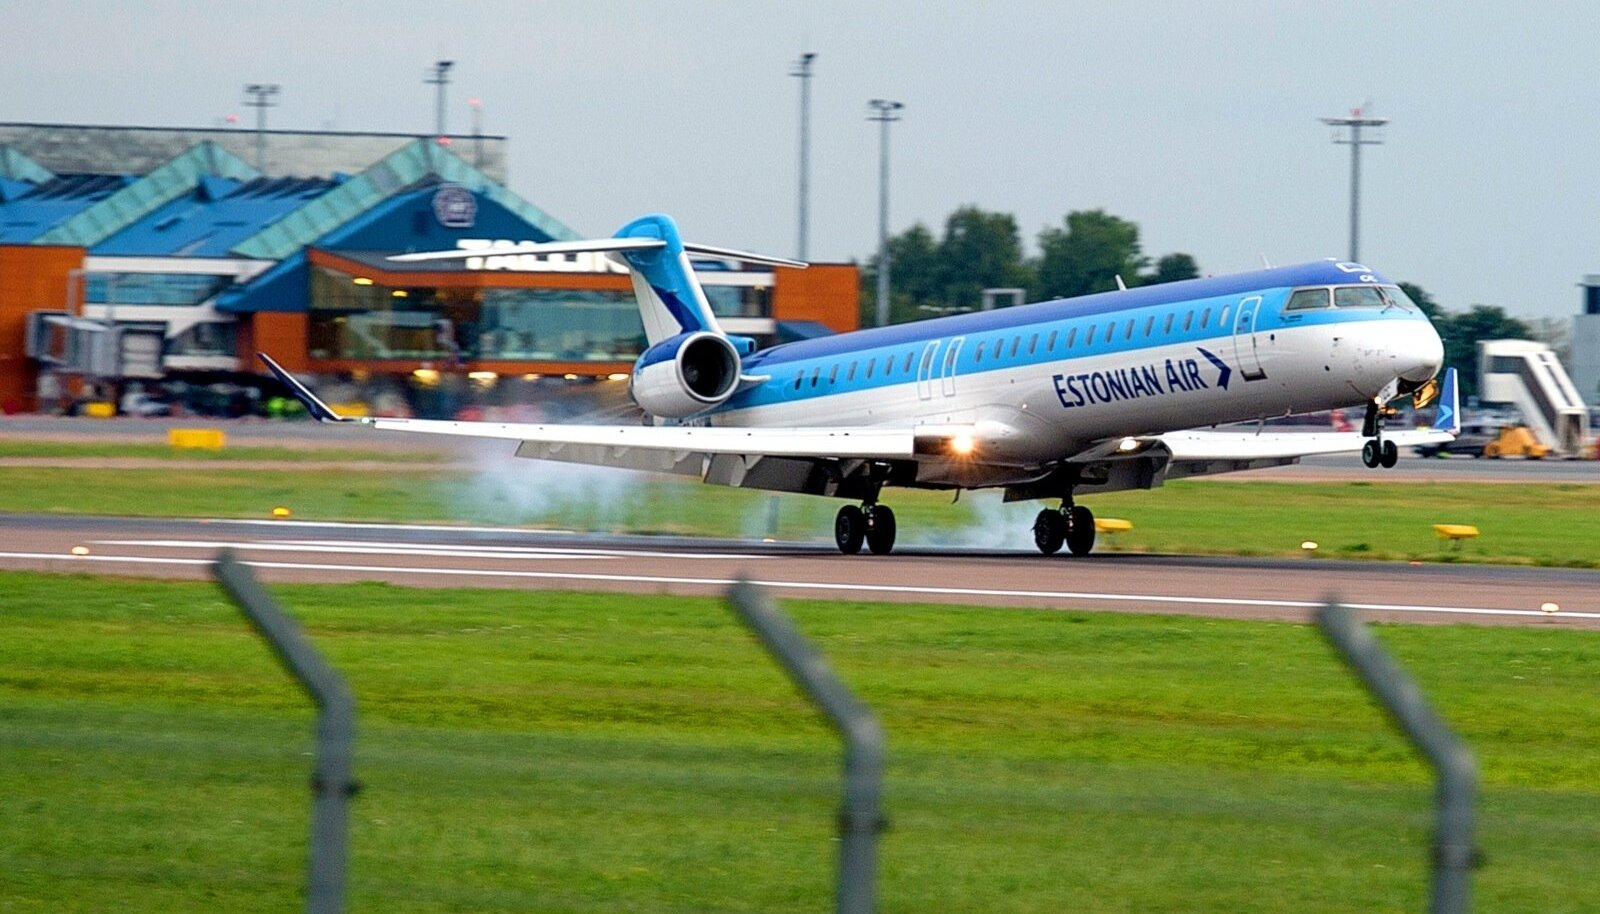 Estonian Airi hädamaandumine  2014